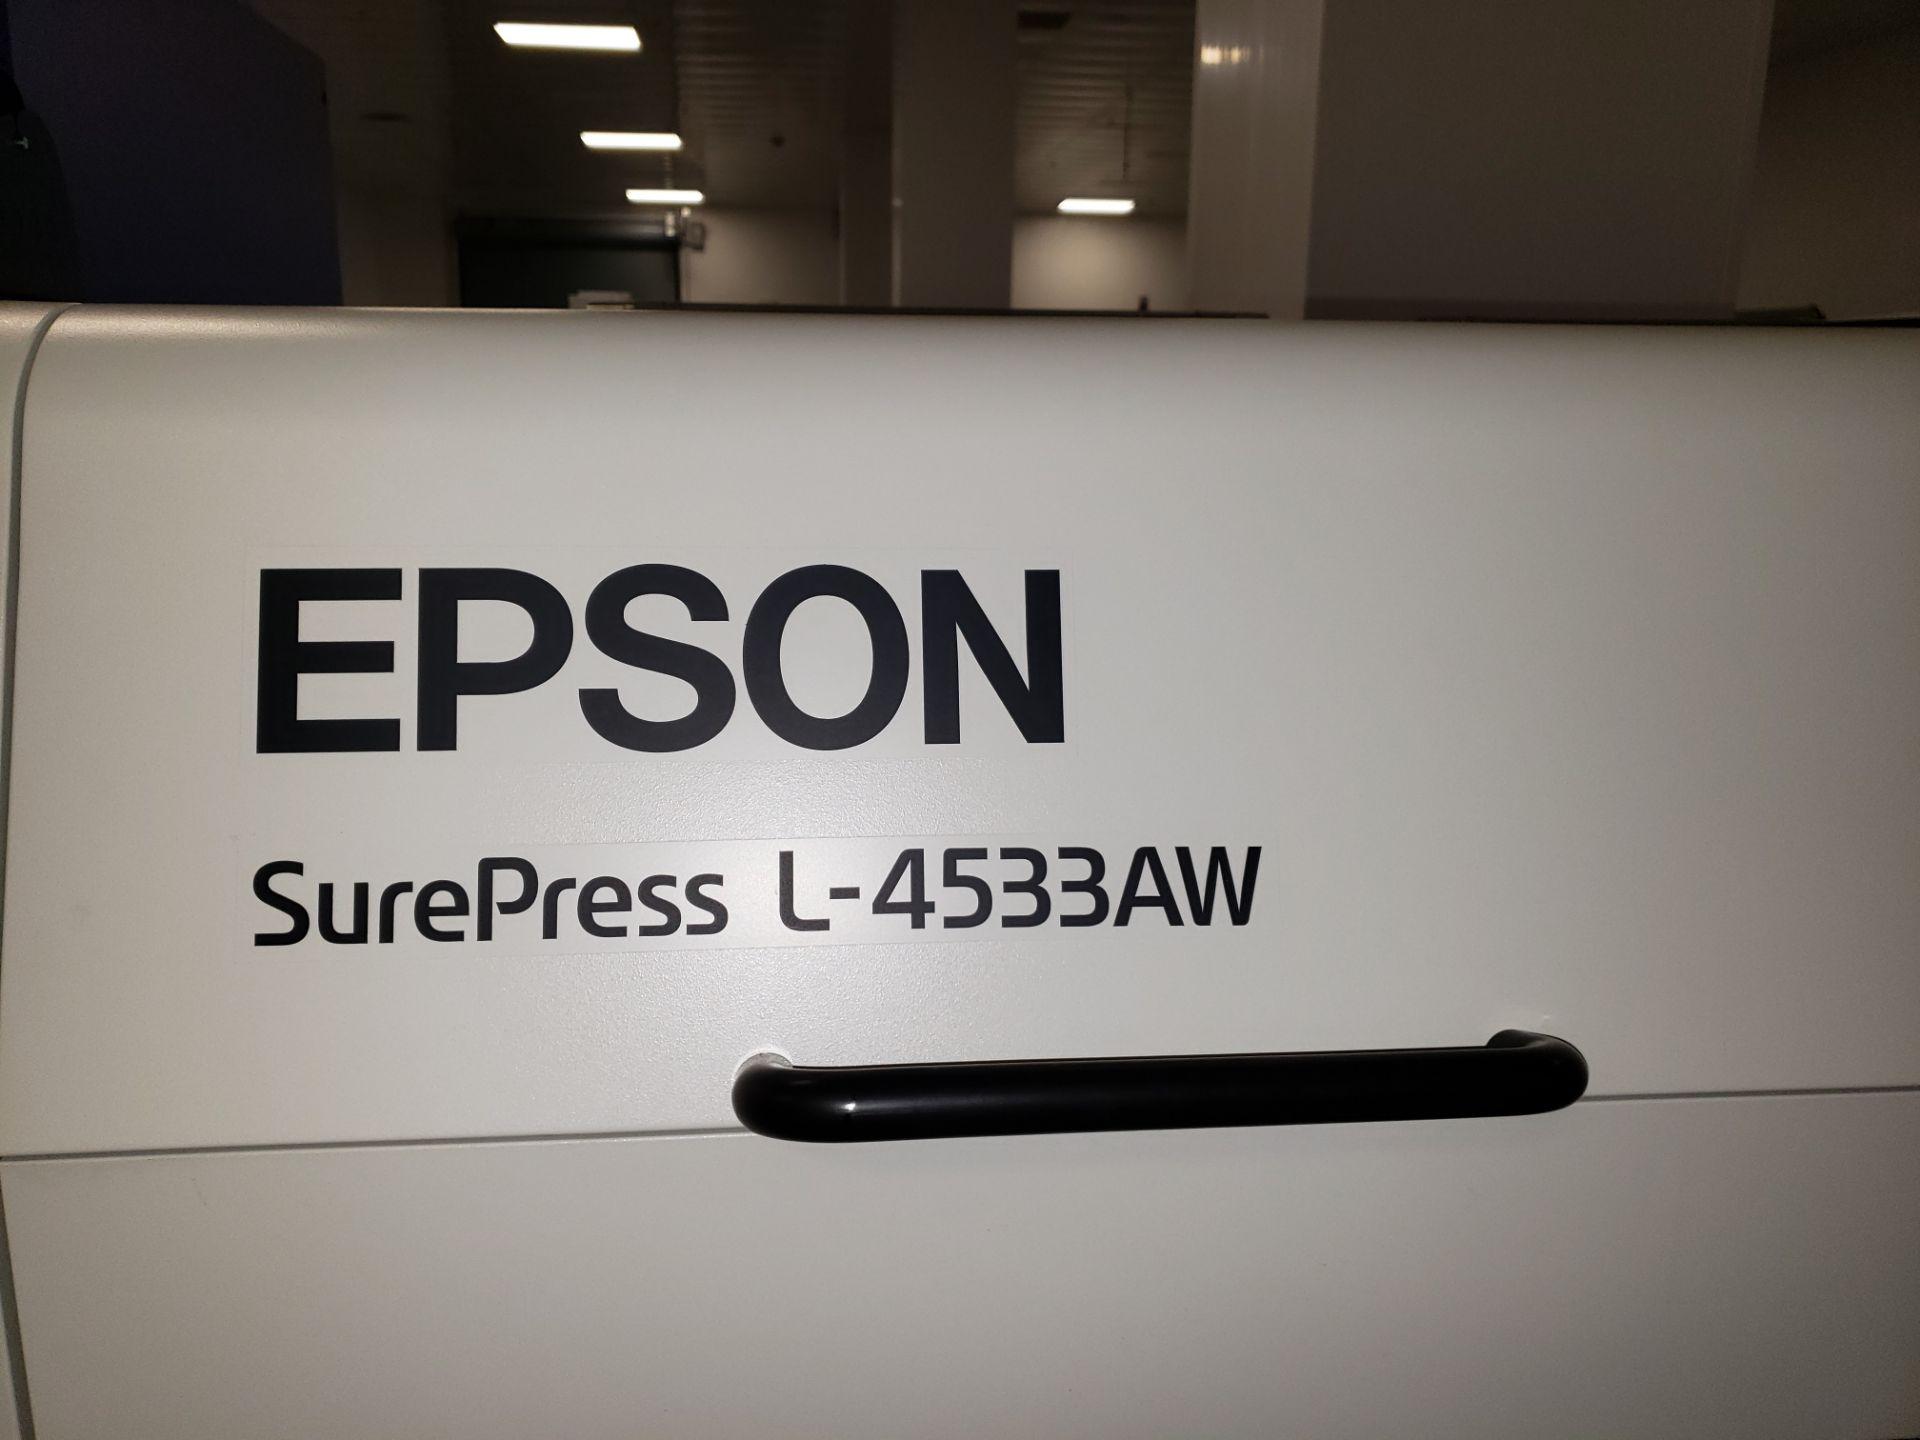 Lot 3 - EPSON SUREPRESS DIGITAL LABEL PRESS L-4533AW, MODEL N721A